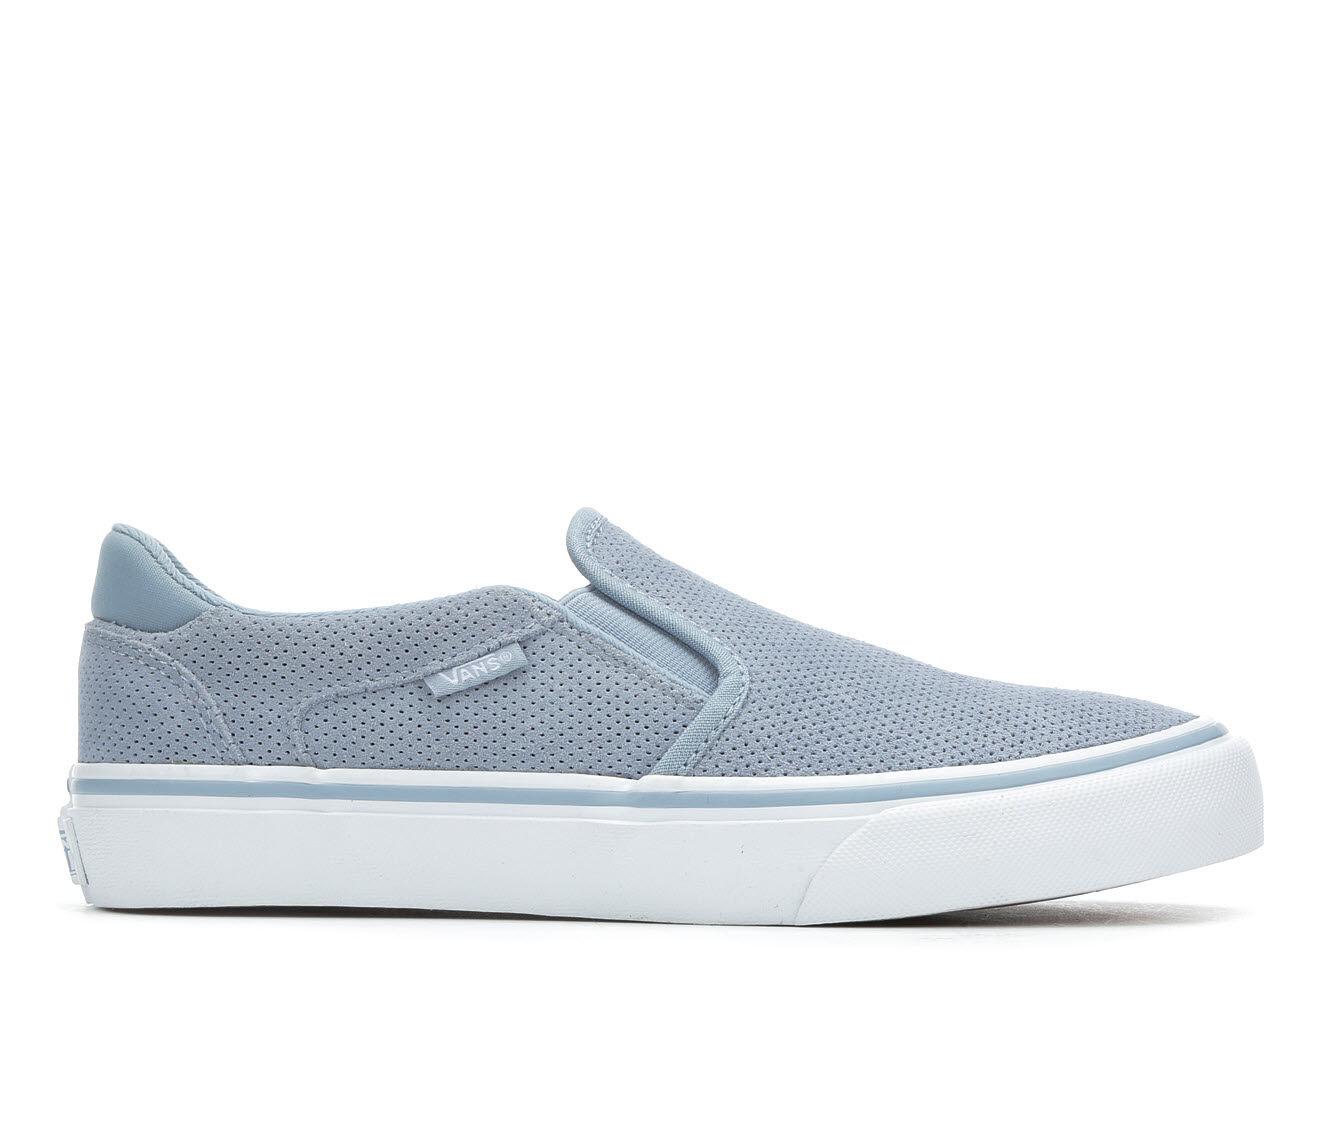 Wholesale Price Women's Vans Asher Deluxe Skate Shoes Blue Fog/Wht